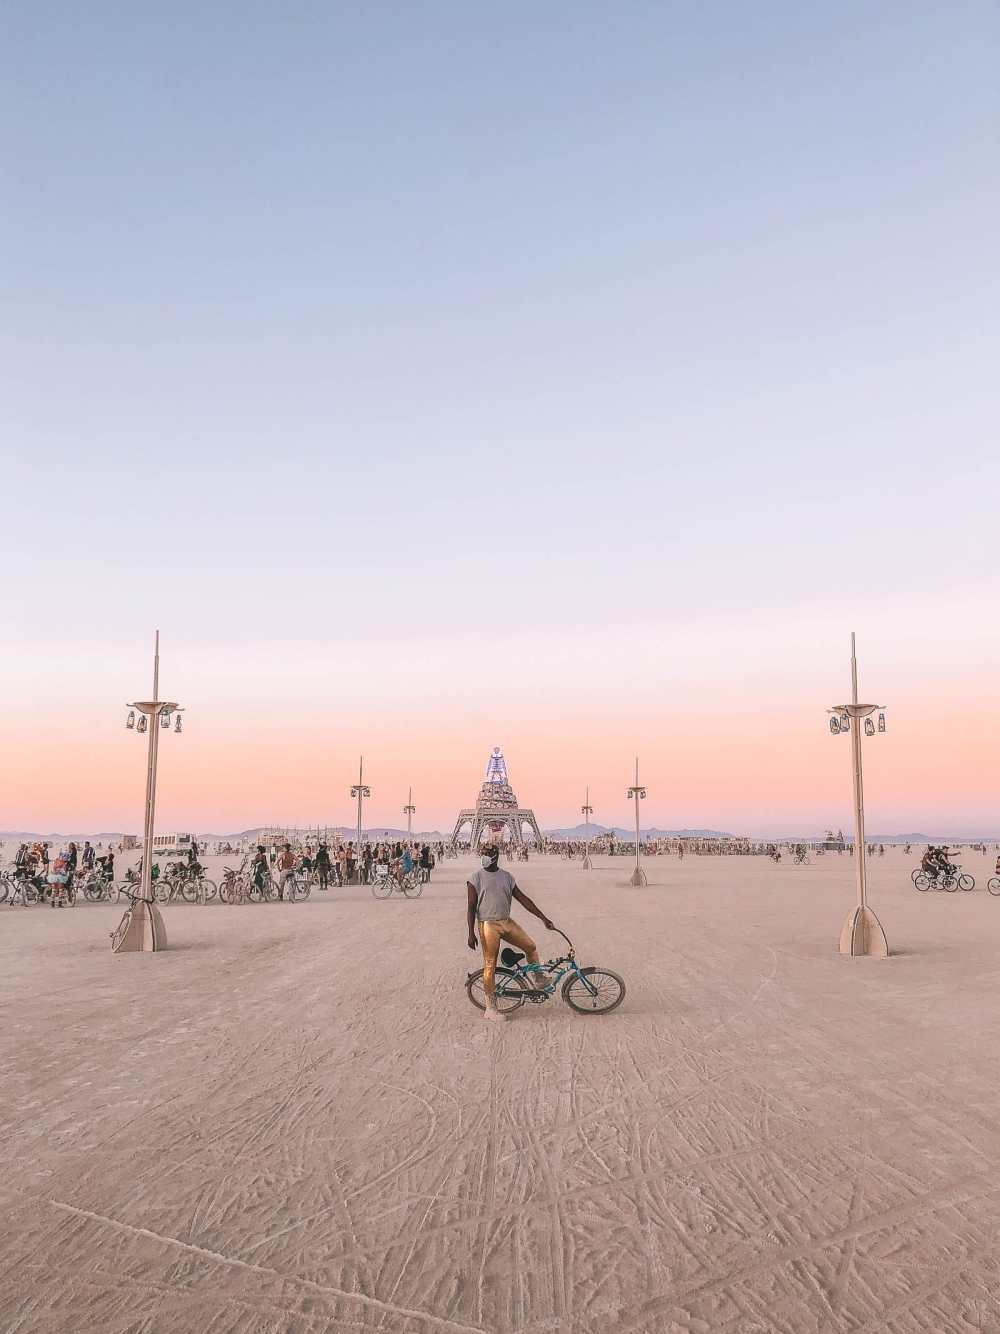 Руководство для новичков по Burning Man (7)